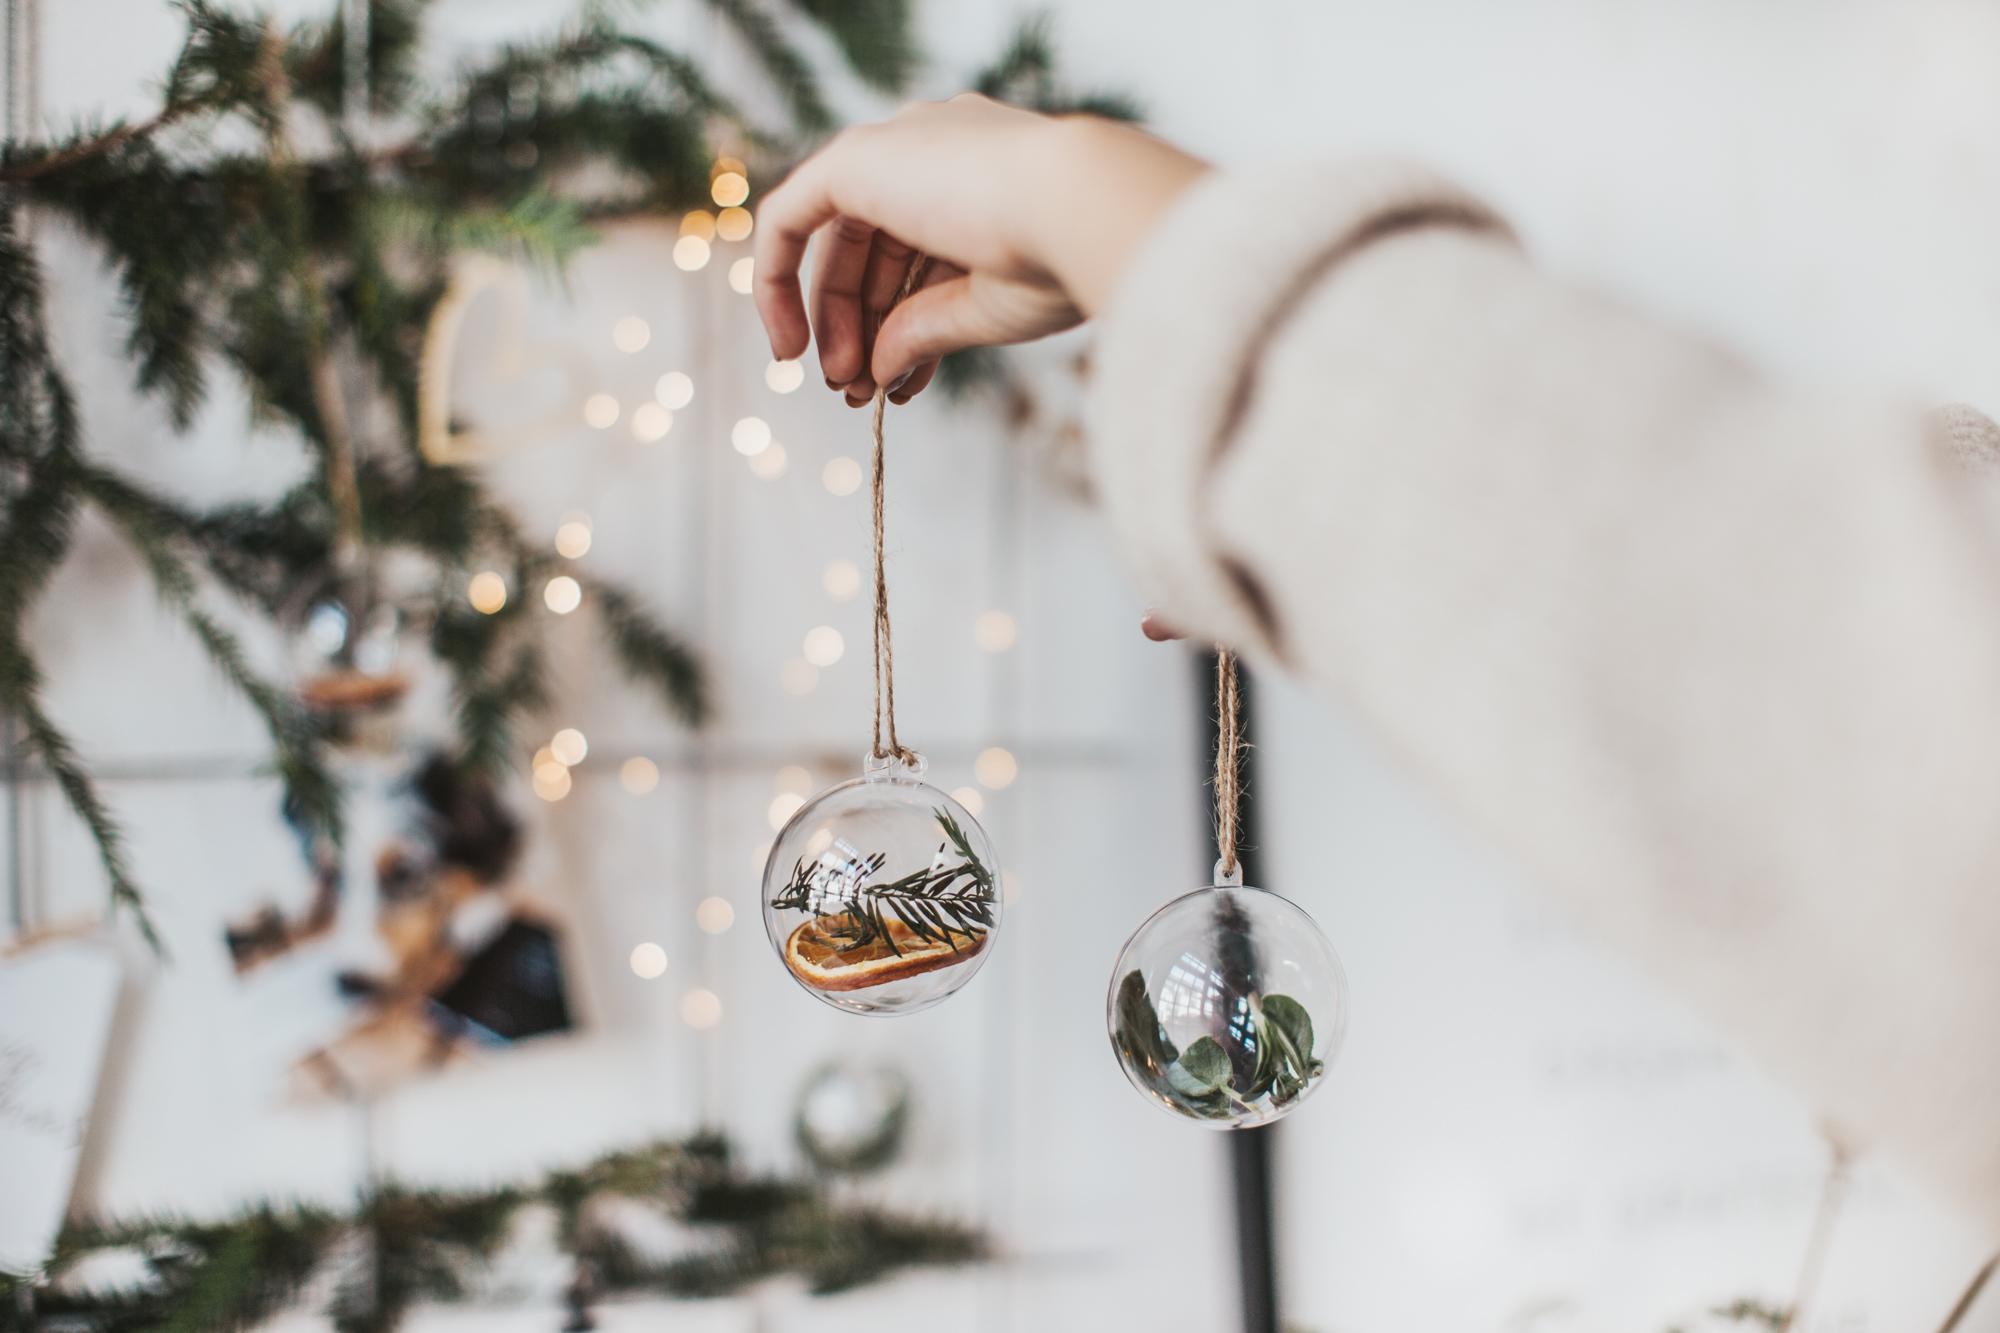 JO_and_JUDY_Christmas_Ornaments_DIY_07sxBdebZdv9HQI